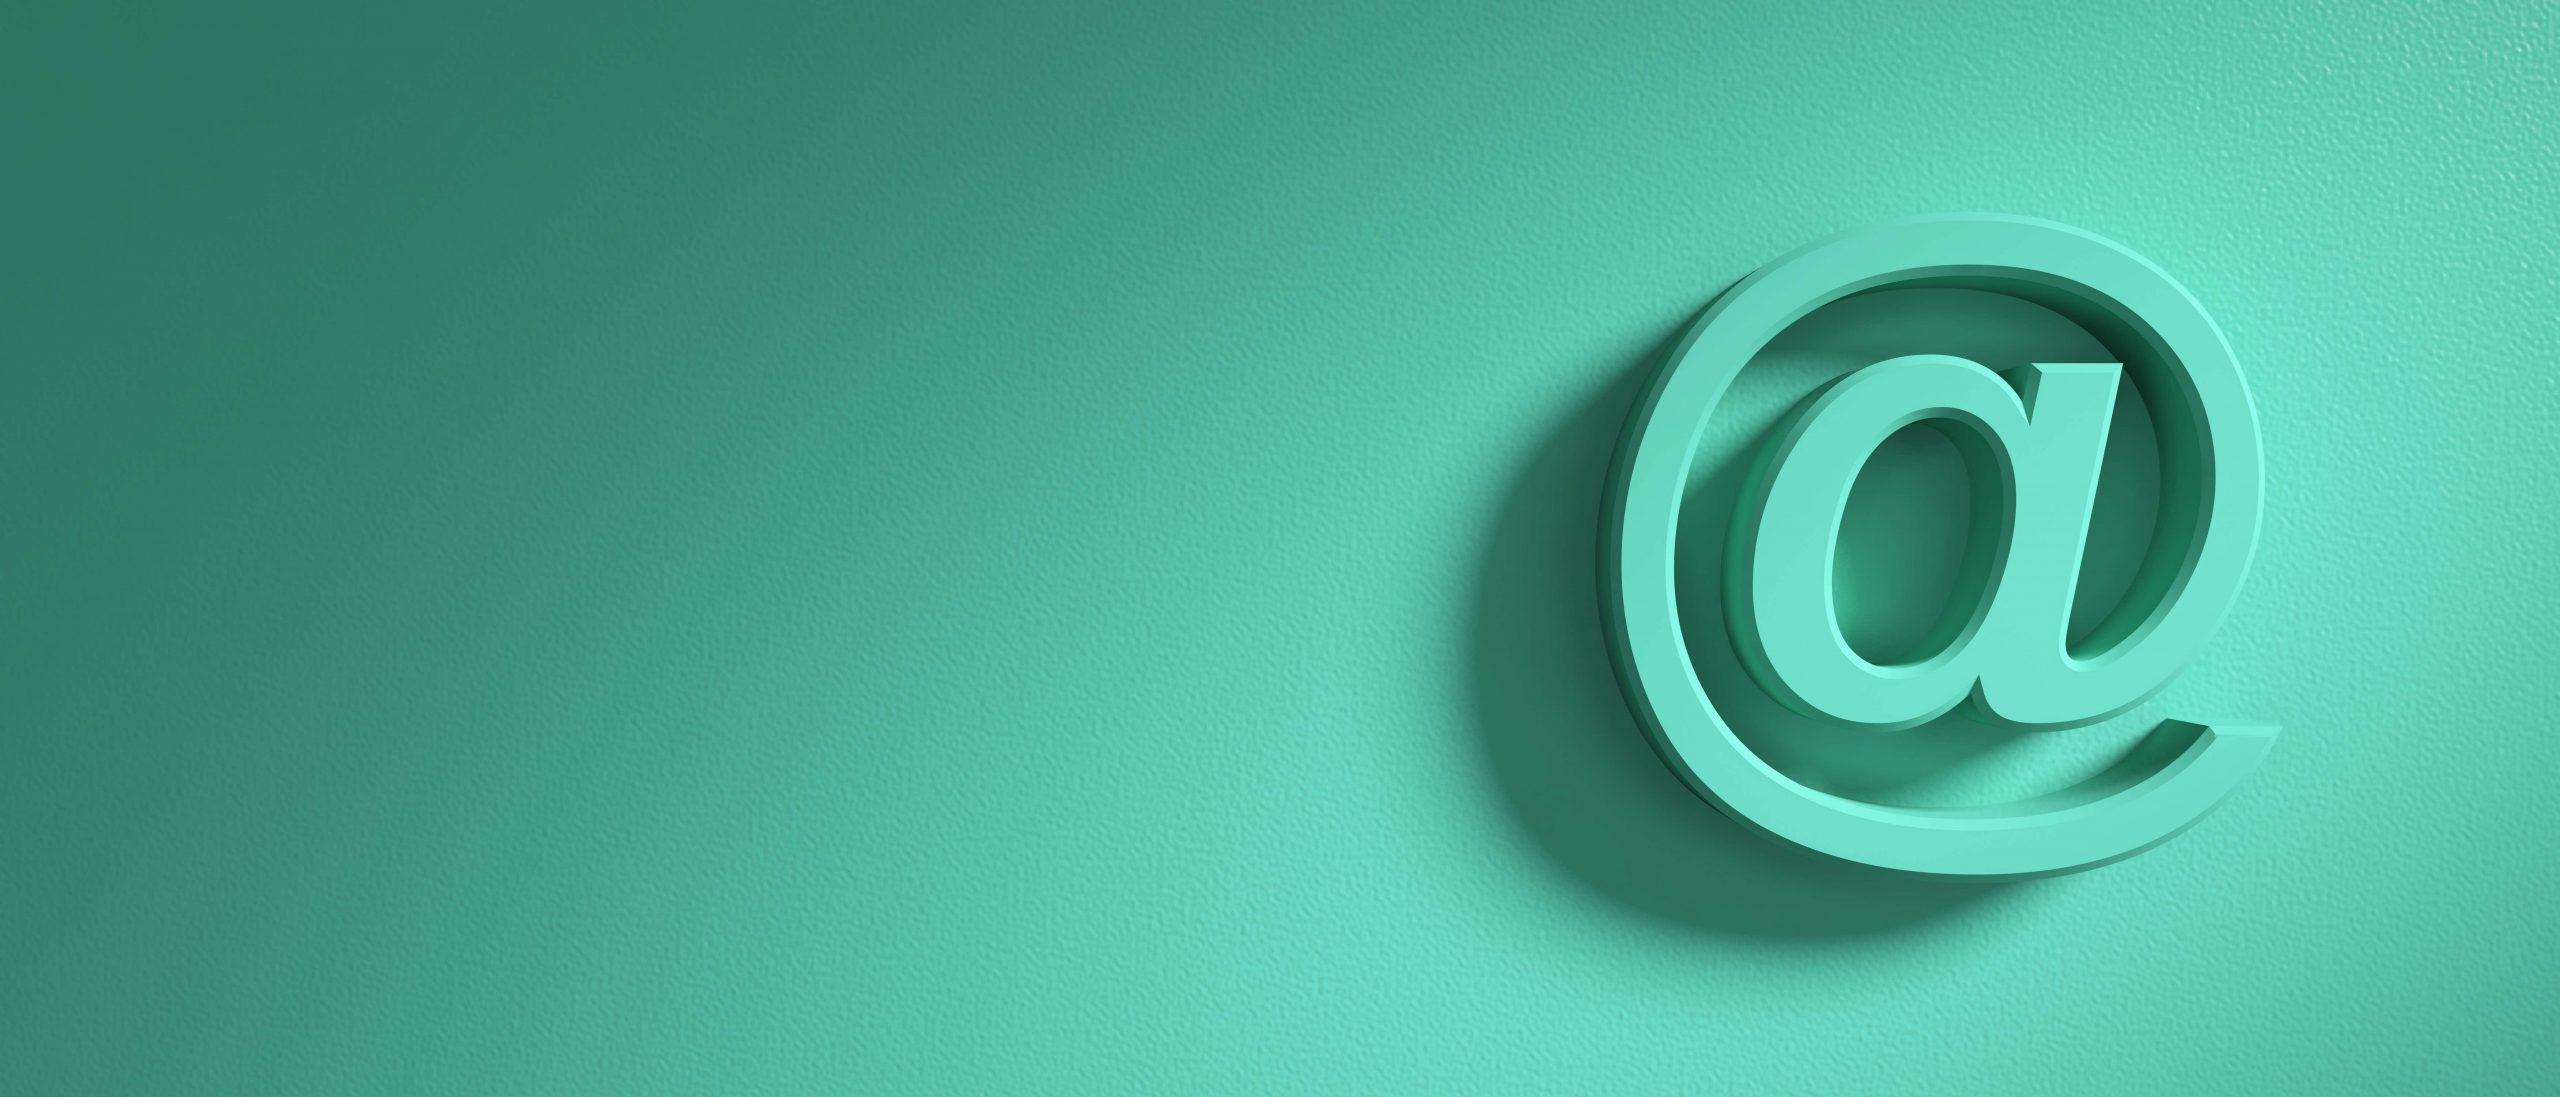 custom lead nurture email campaigns real estate agent operations marketing realtors